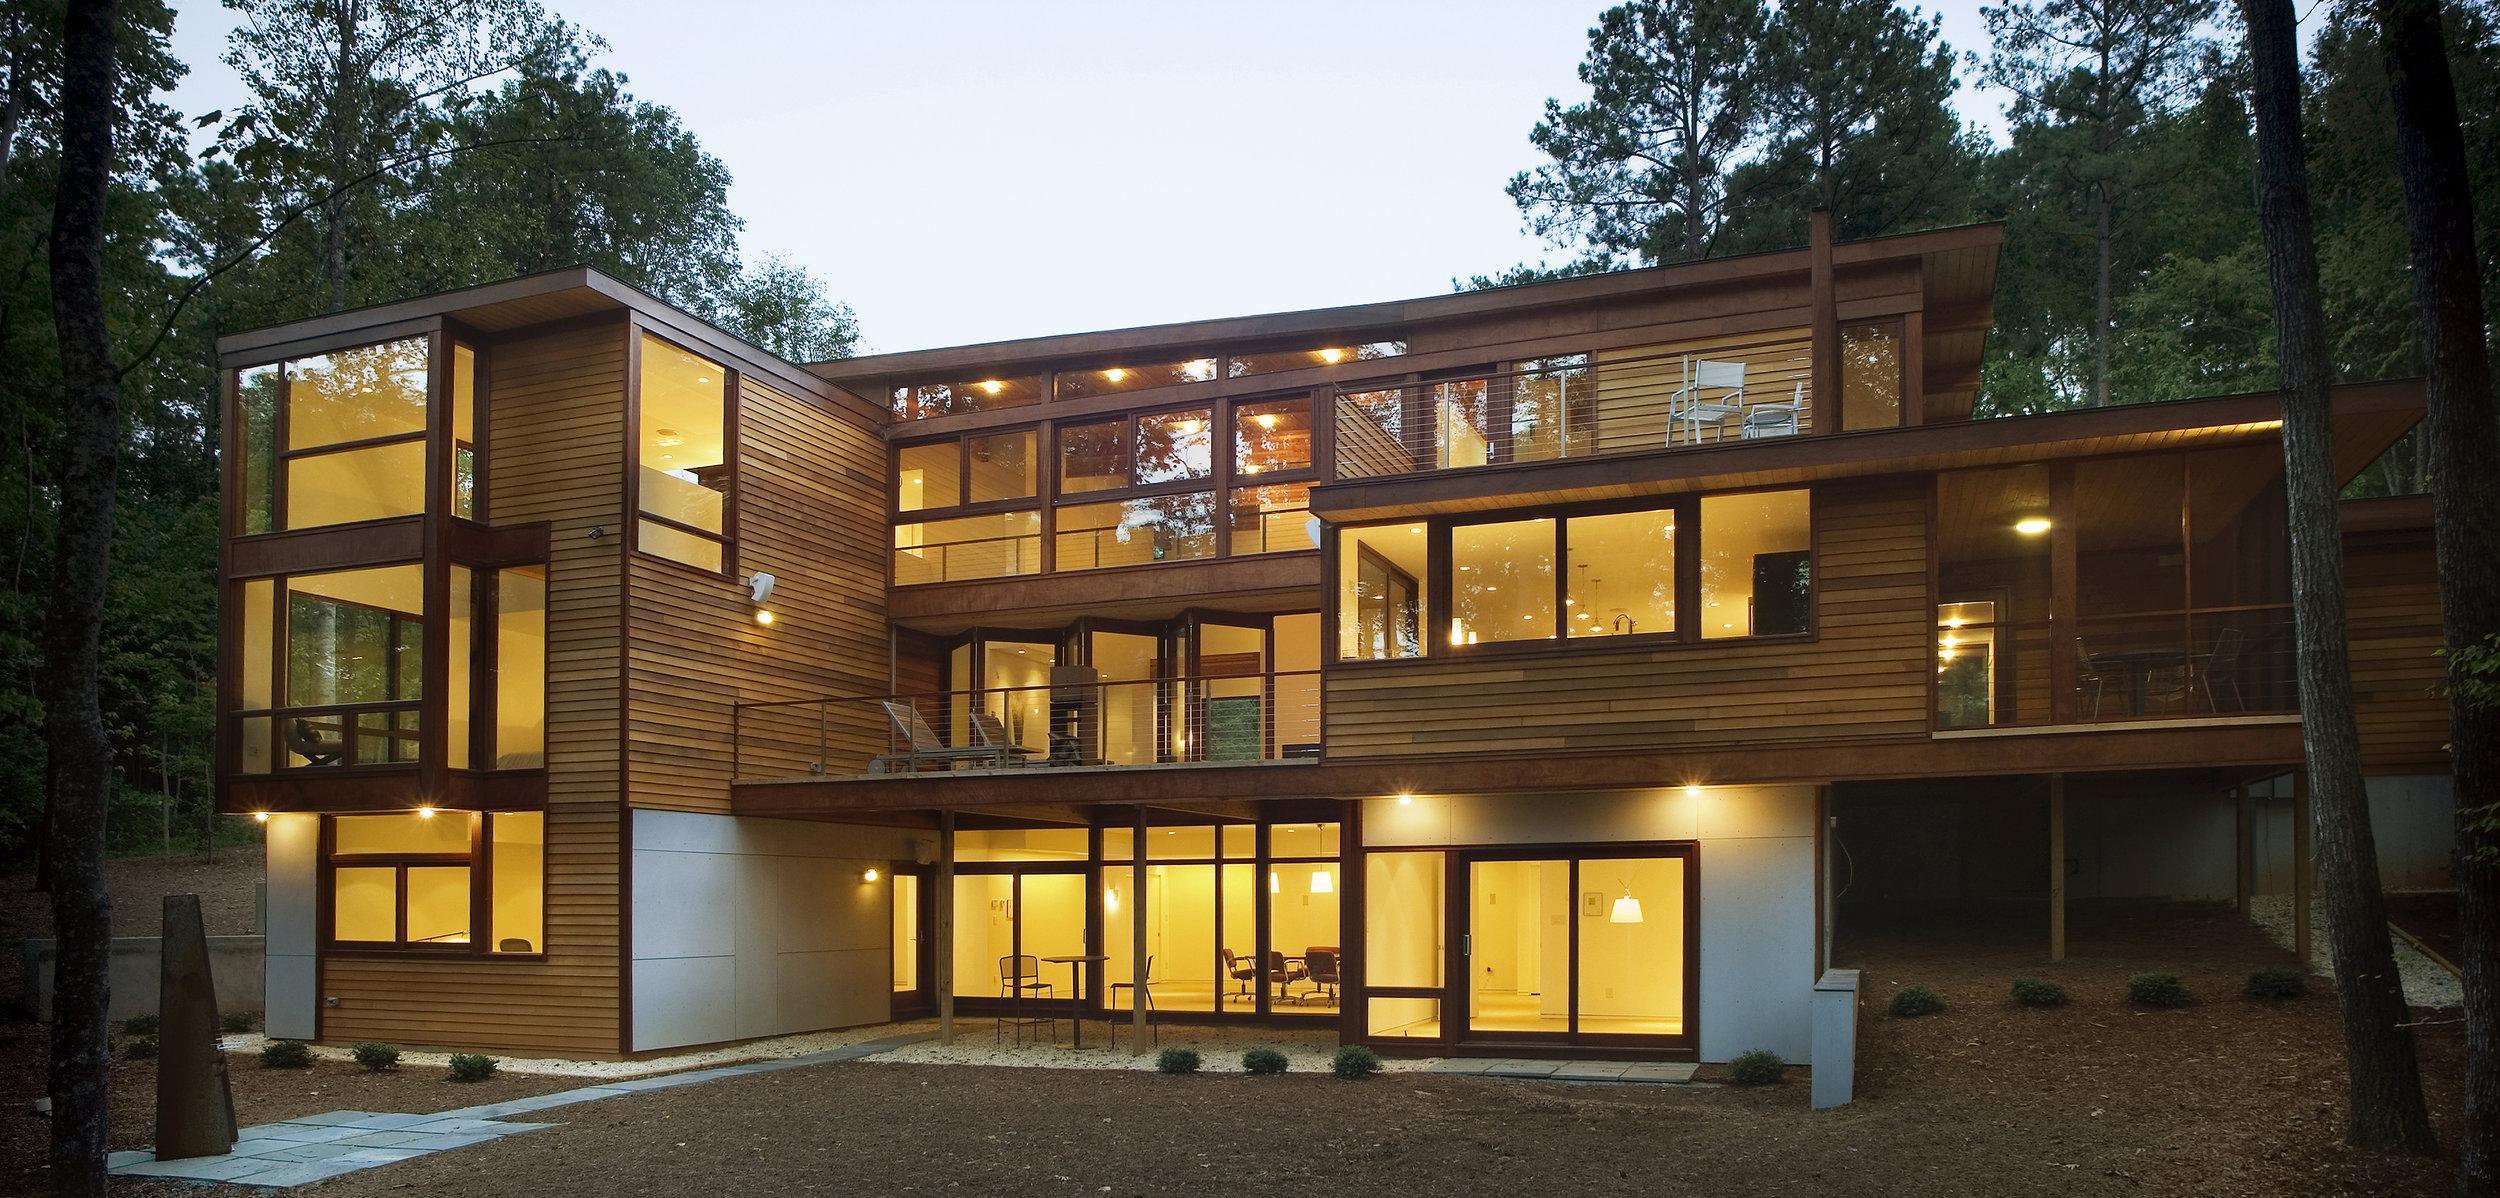 turkel_modern_design_prefab_home_redhill_hillsborough_facade.jpg